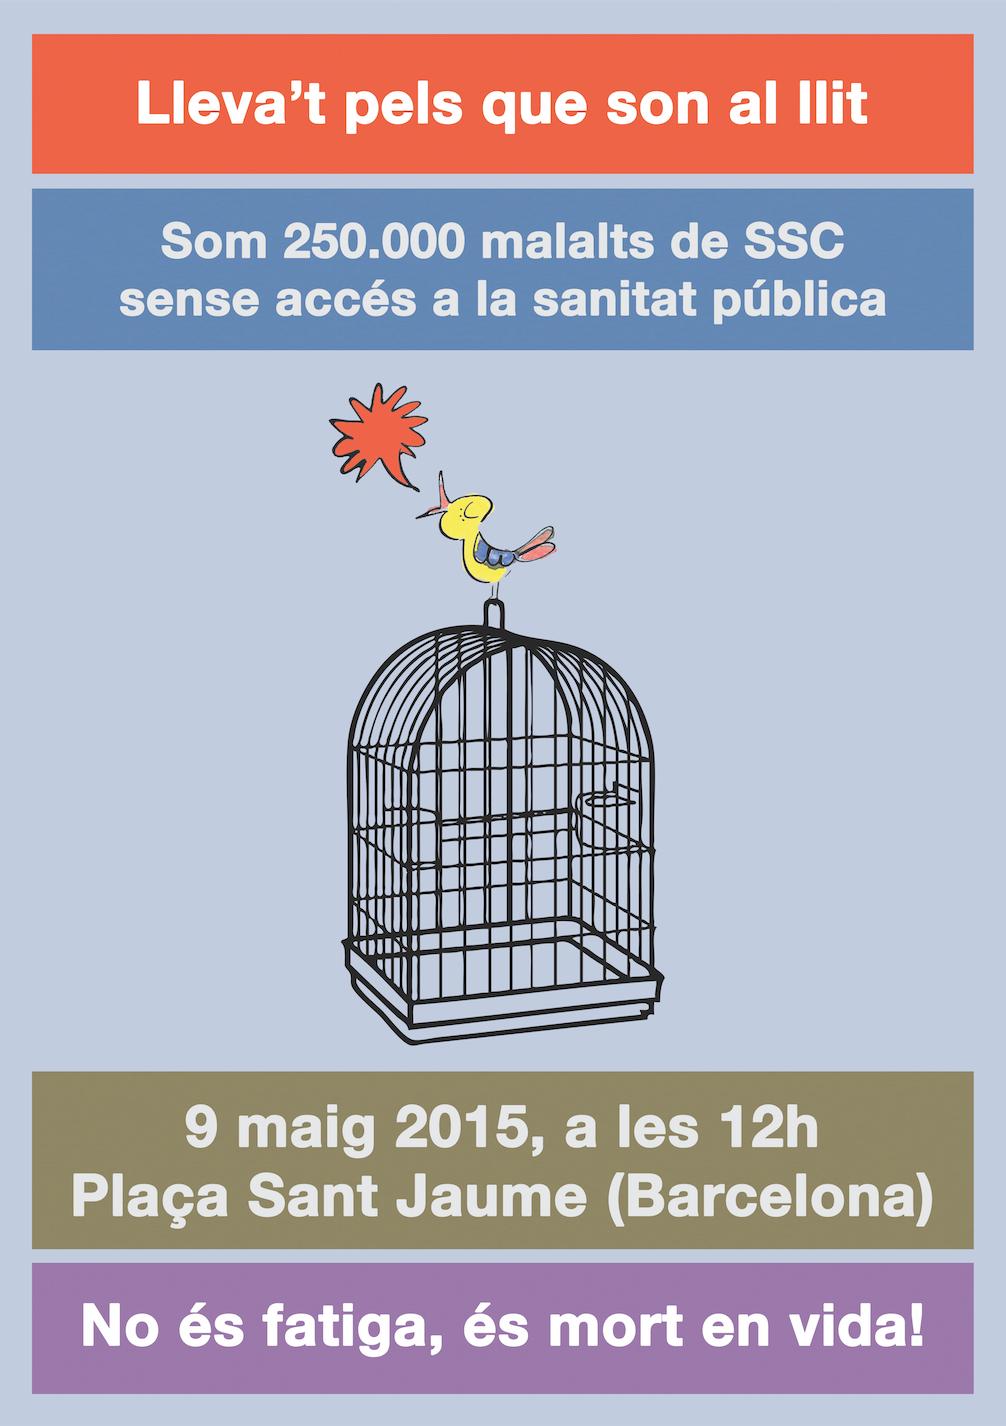 9 de Mayo del 2015, a las 12 h - Plaça Sant Jaume de Barcelona